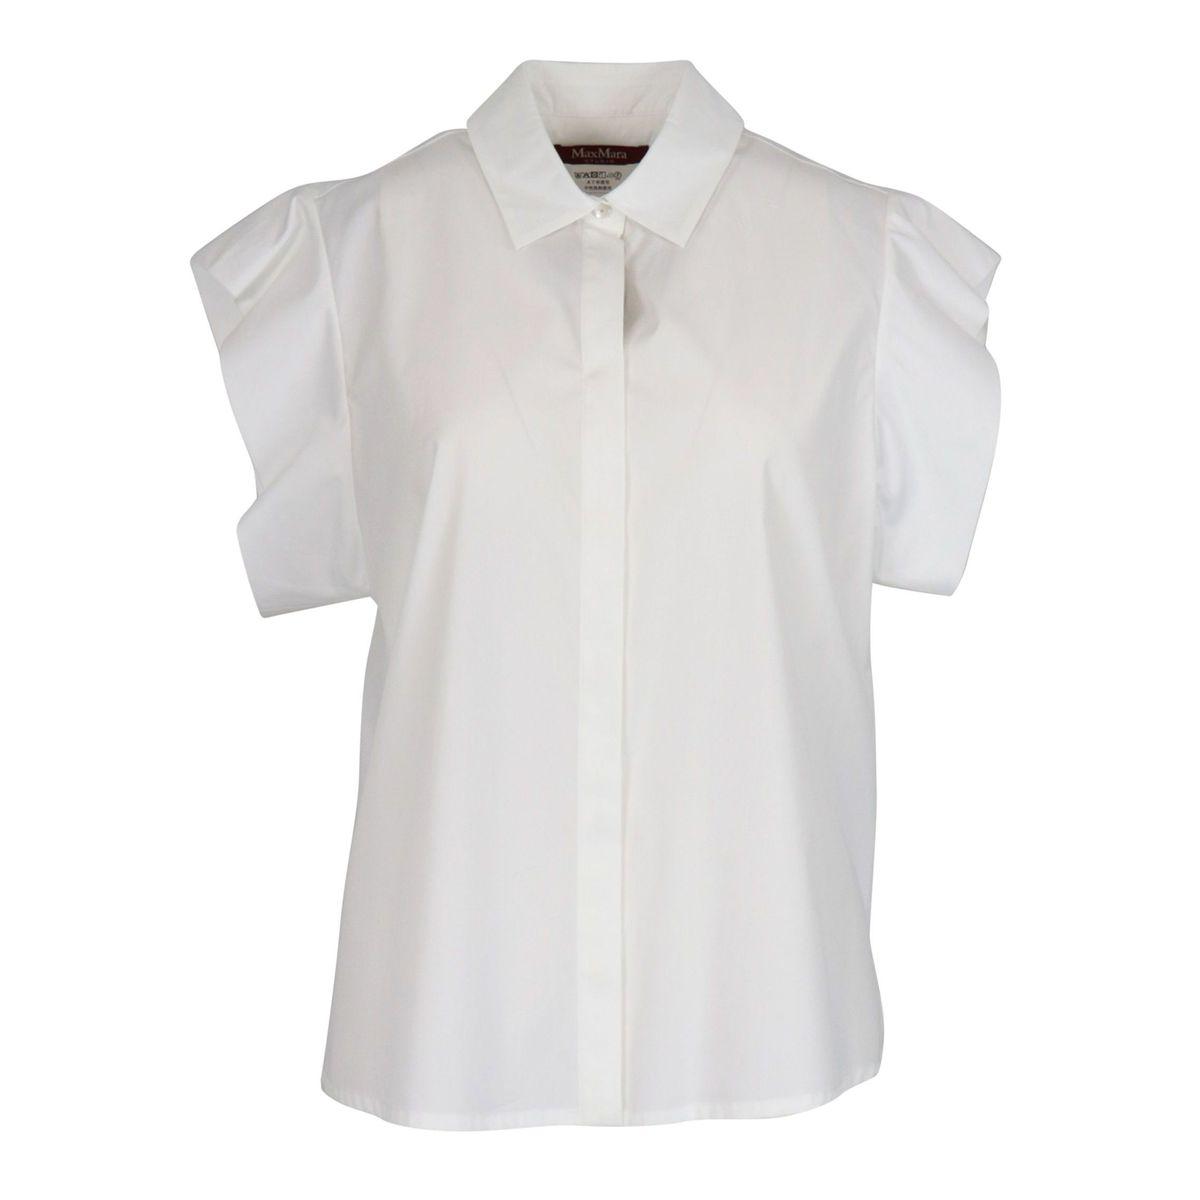 Muscari shirt in cotton with cap sleeves White MAX MARA STUDIO